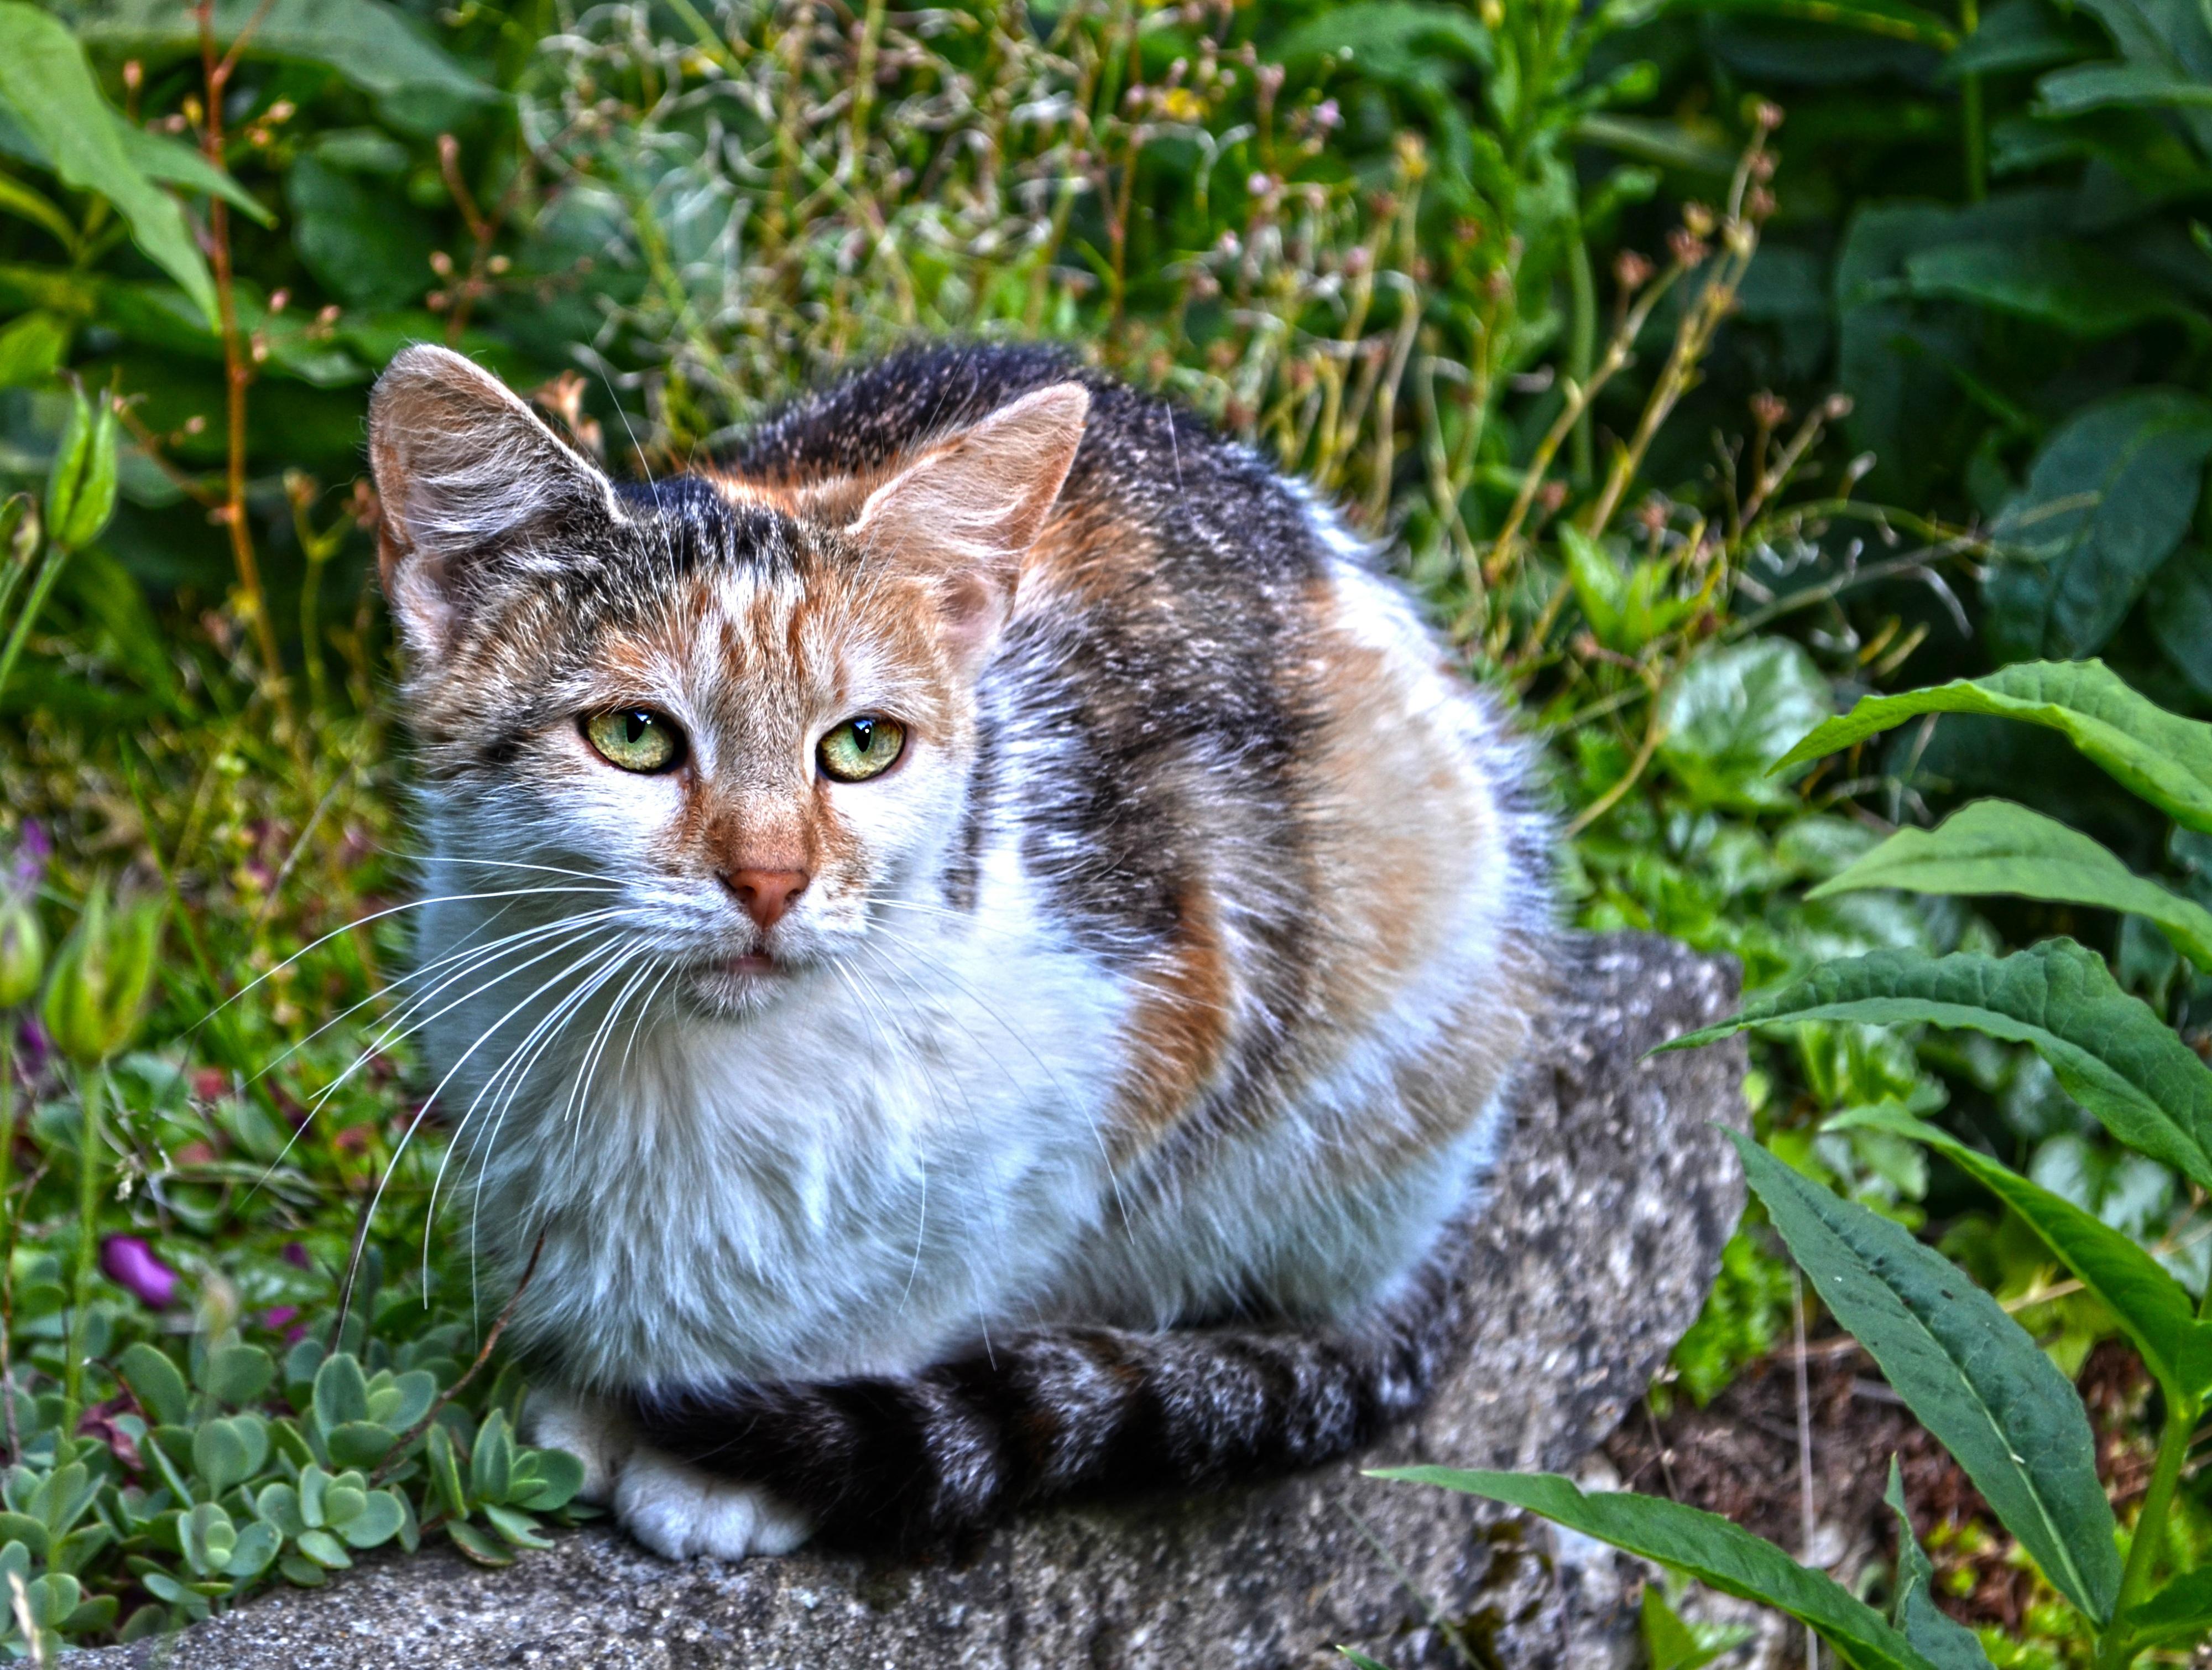 Color cats like - Grass Flower Animal Stone Wildlife Kitten Cat Color Mammal Fauna Whiskers Vertebrate European Shorthair Wild Cat